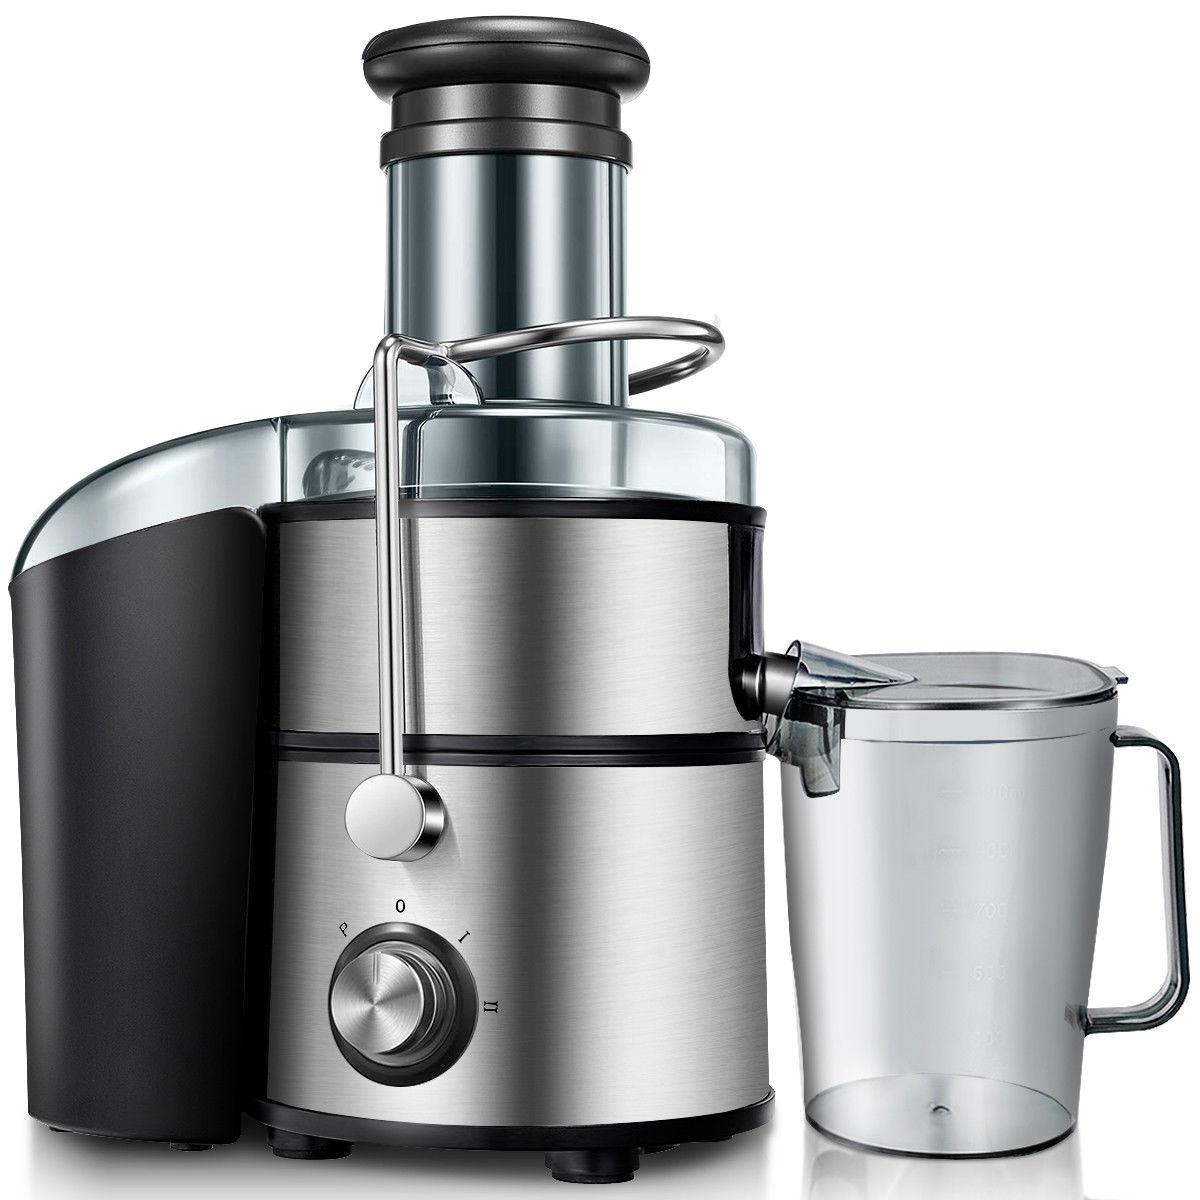 Gymax 5in1 Multifunction Juice Extractor Juicer Blender Grinder Chopper Food Processor - image 9 of 10